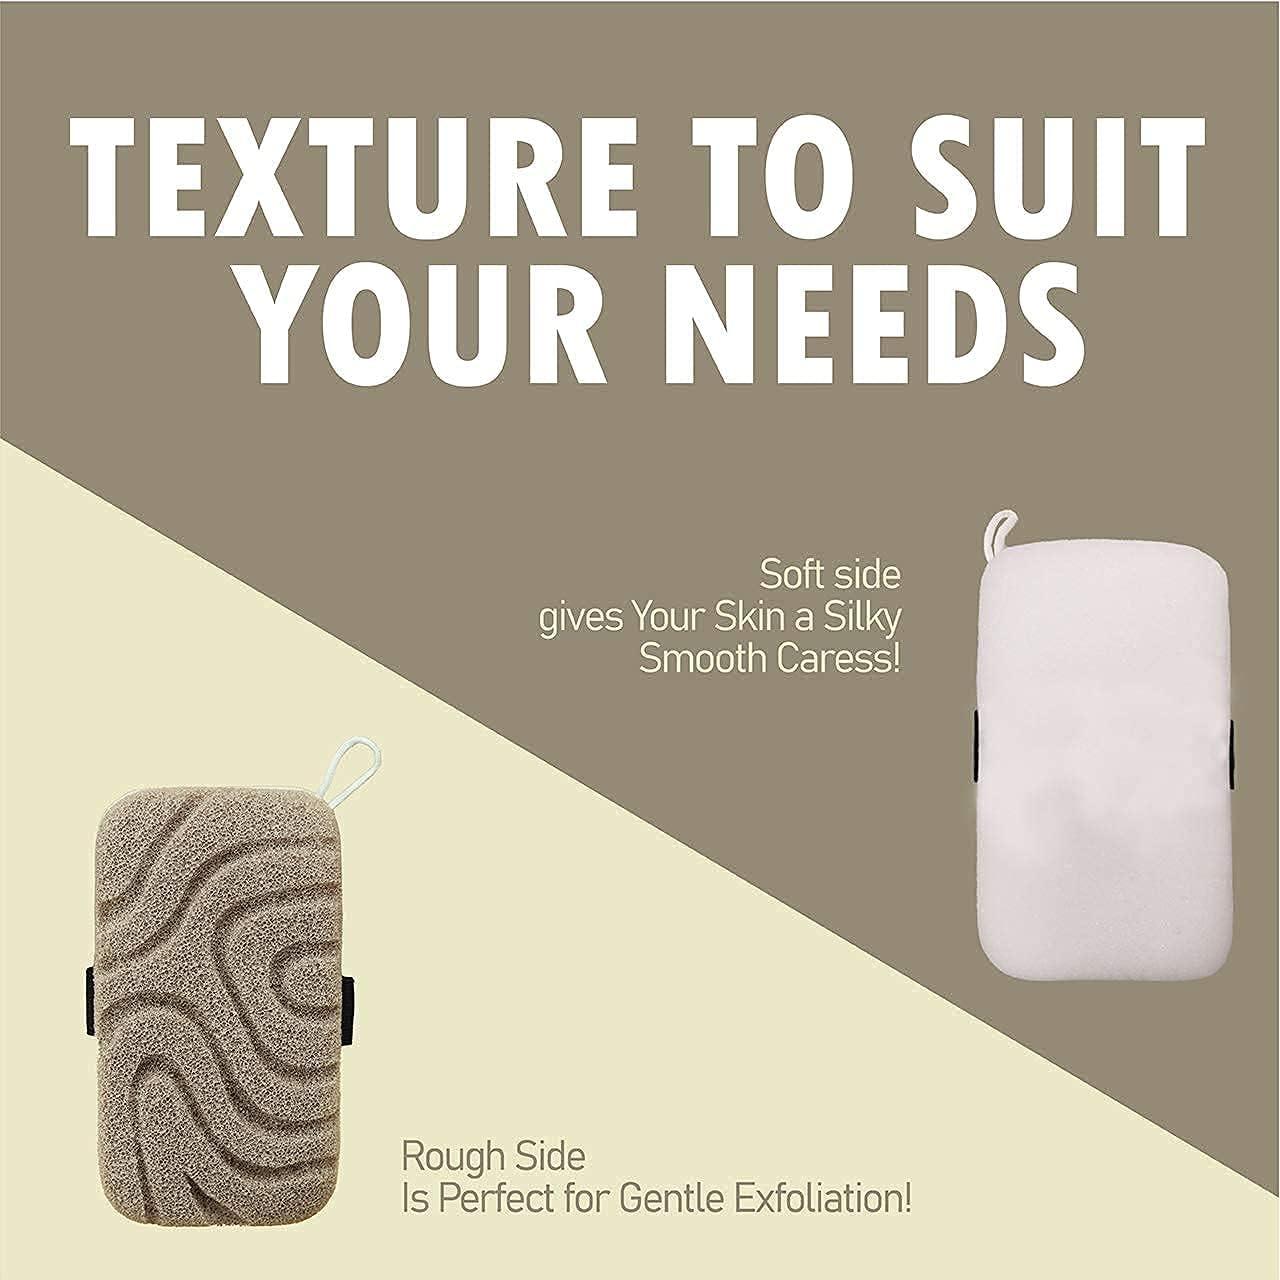 Luxury Mens Loofah Body Exfoliator   Loofah Sponge, Bath Sponge, Beauty Sponge Loofah for Women, 2 Sides, Dual Texture Shower Sponge for Mild Exfoliation and Gentle Cleansing - Body Sponge: Health & Personal Care